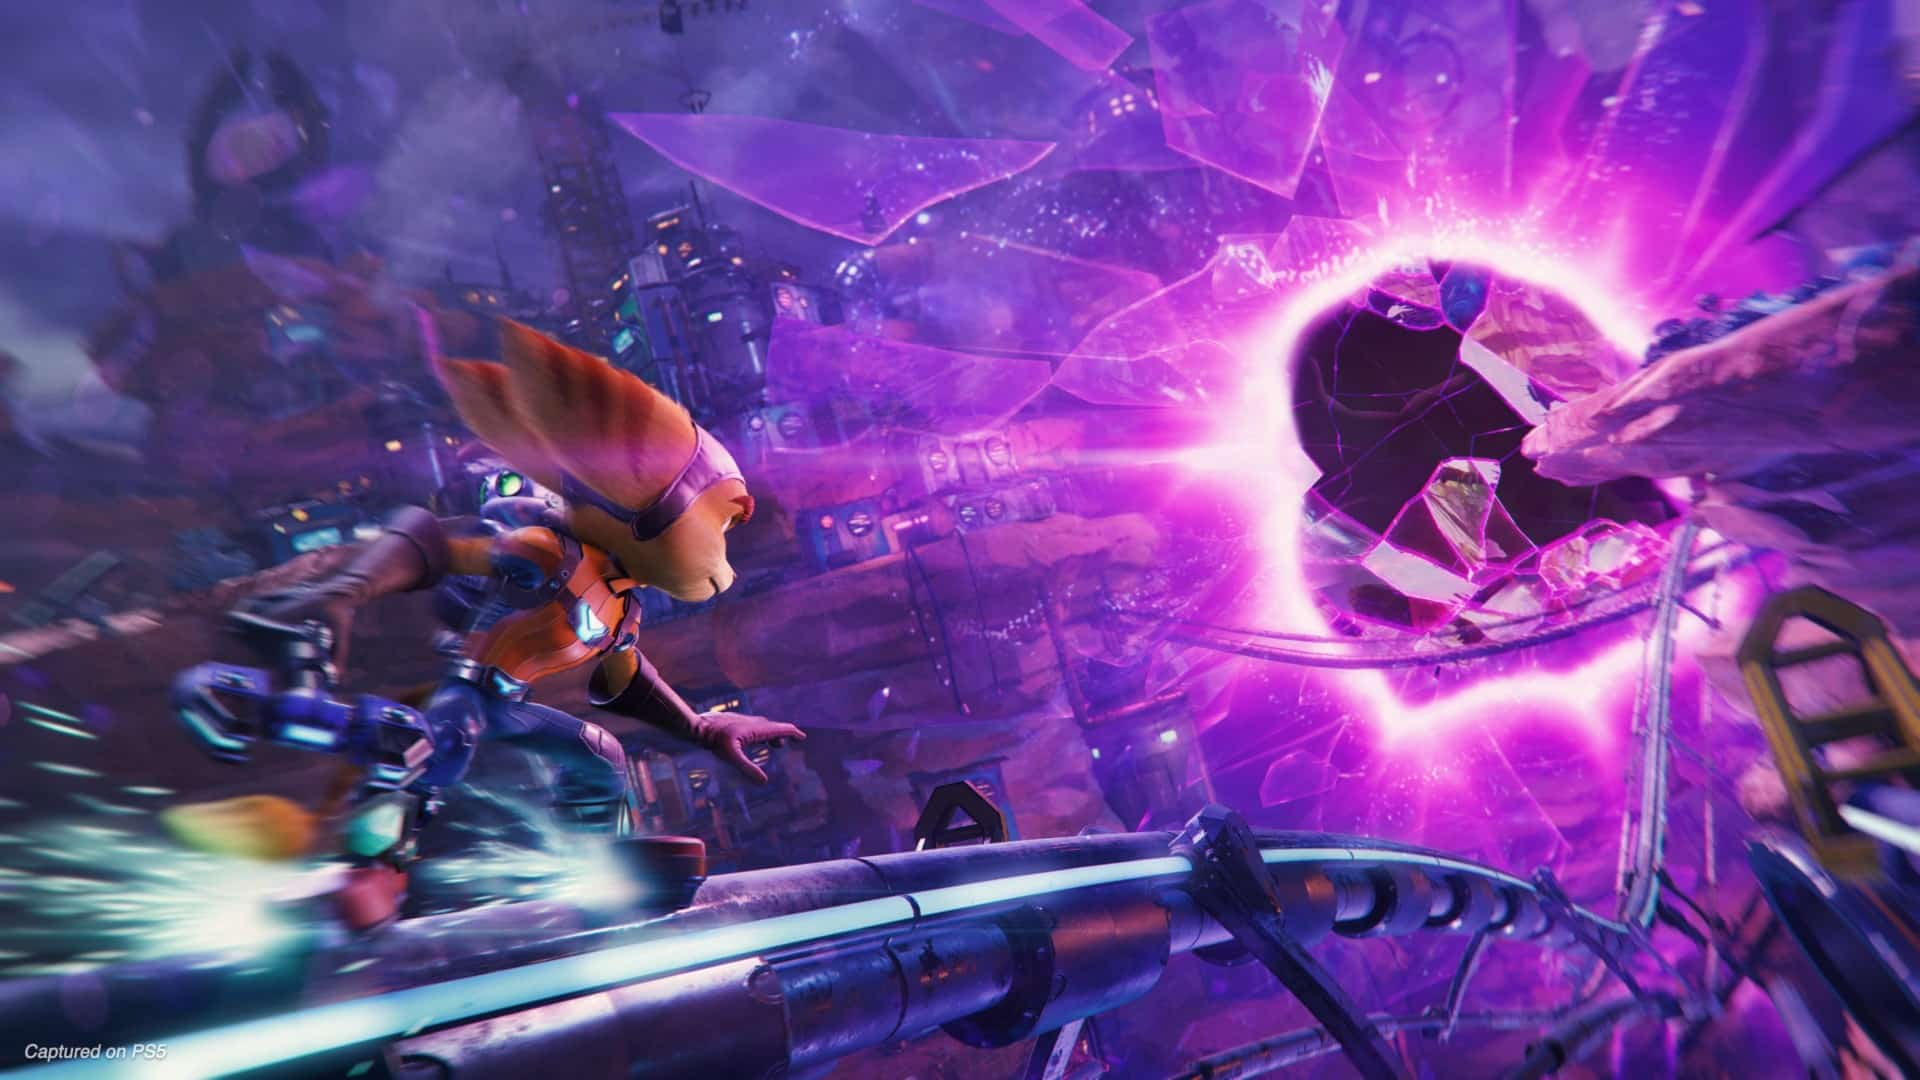 Ratchet & Clank: Rift Apart friendship joy friends adventure infectious Insomniac Games